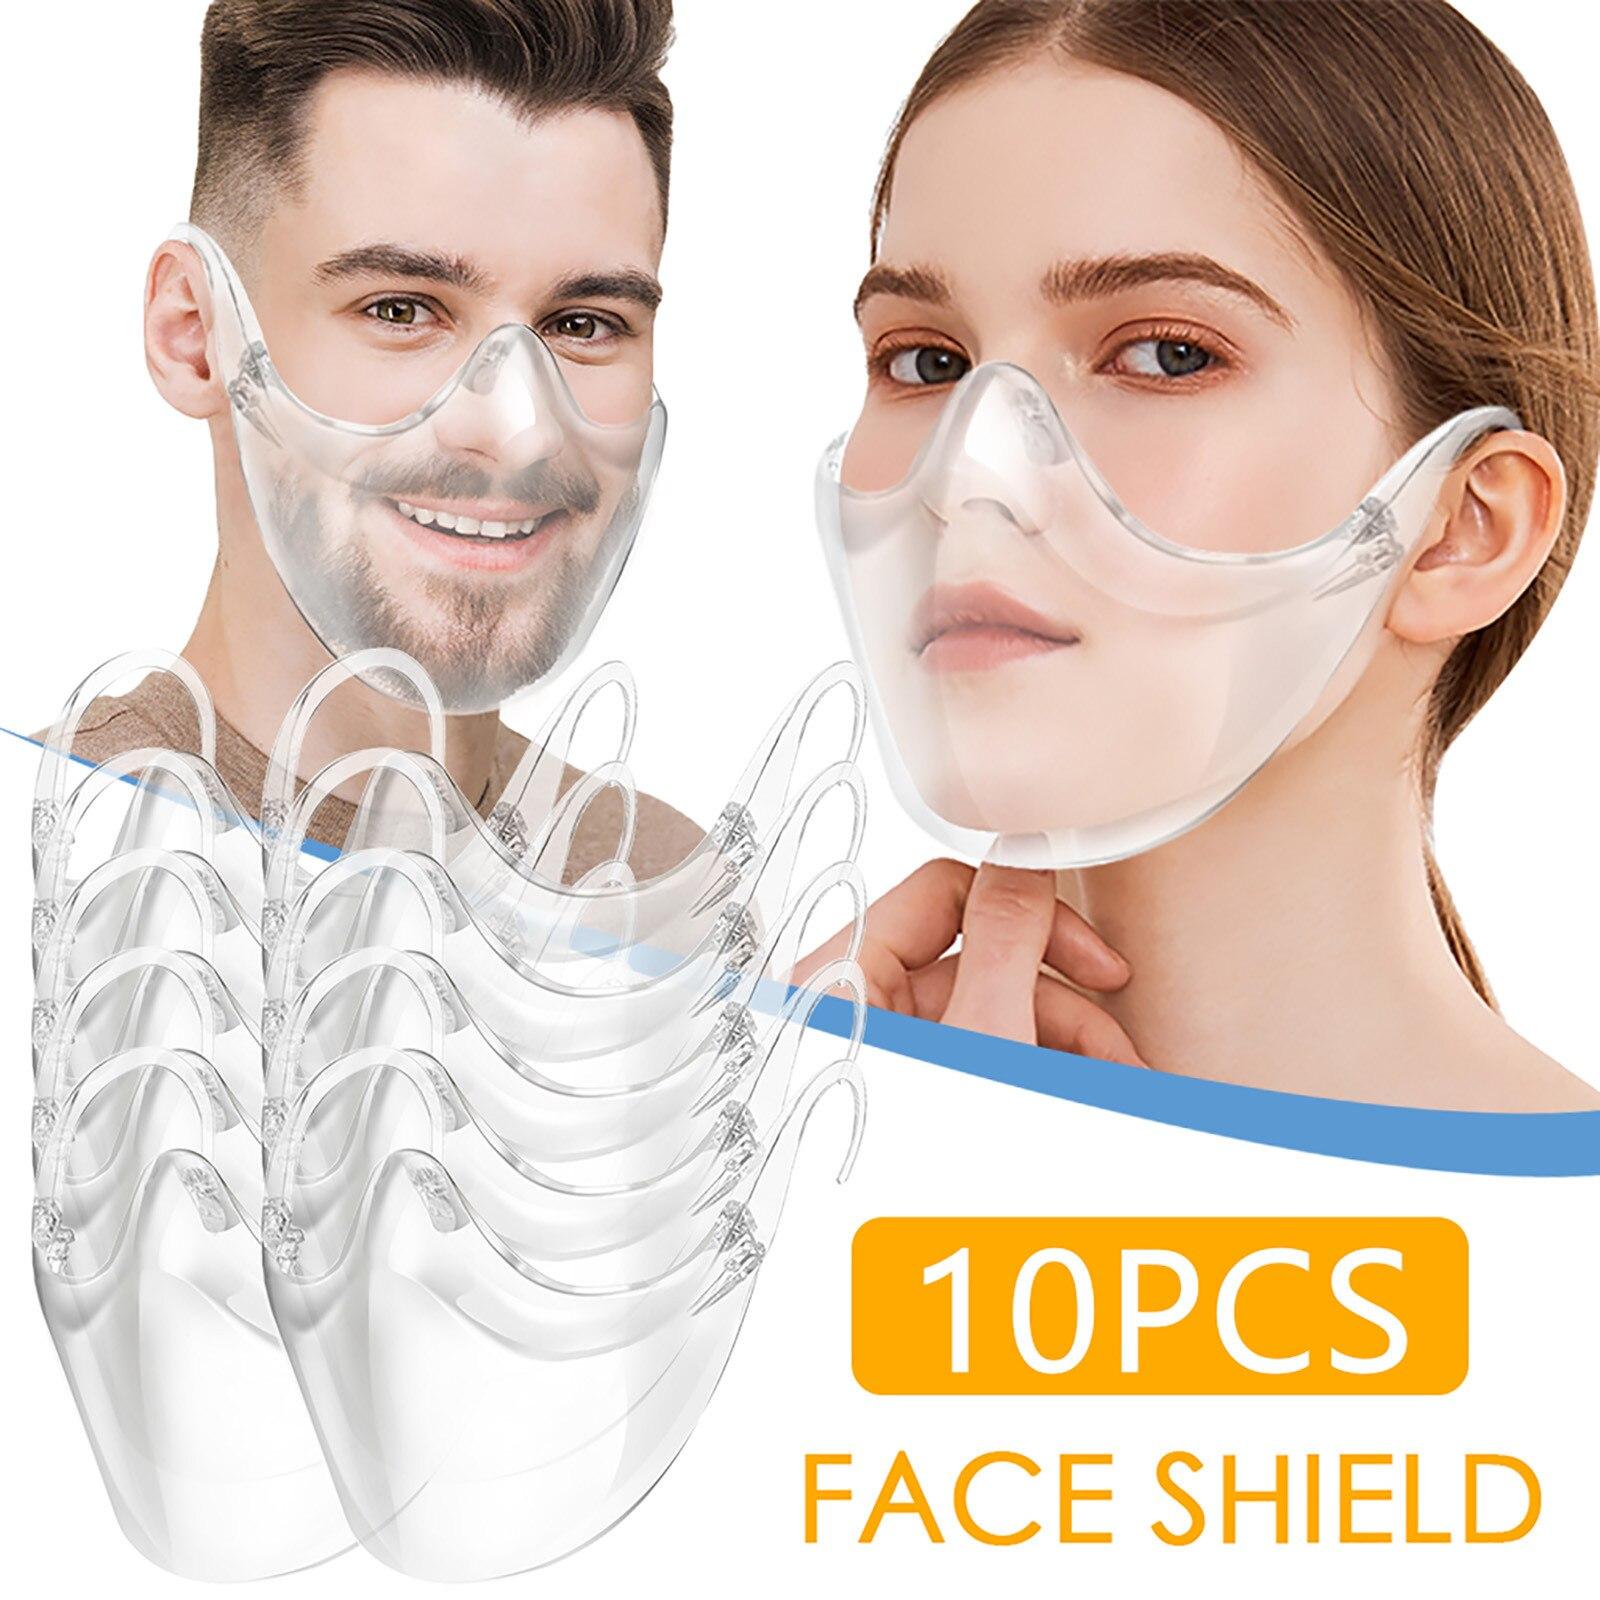 10Pcs Transparent protective maske Hygiene Safety Face Shield PVC Anti-Splash anti-spray Food Face Shield For Mouth Nose